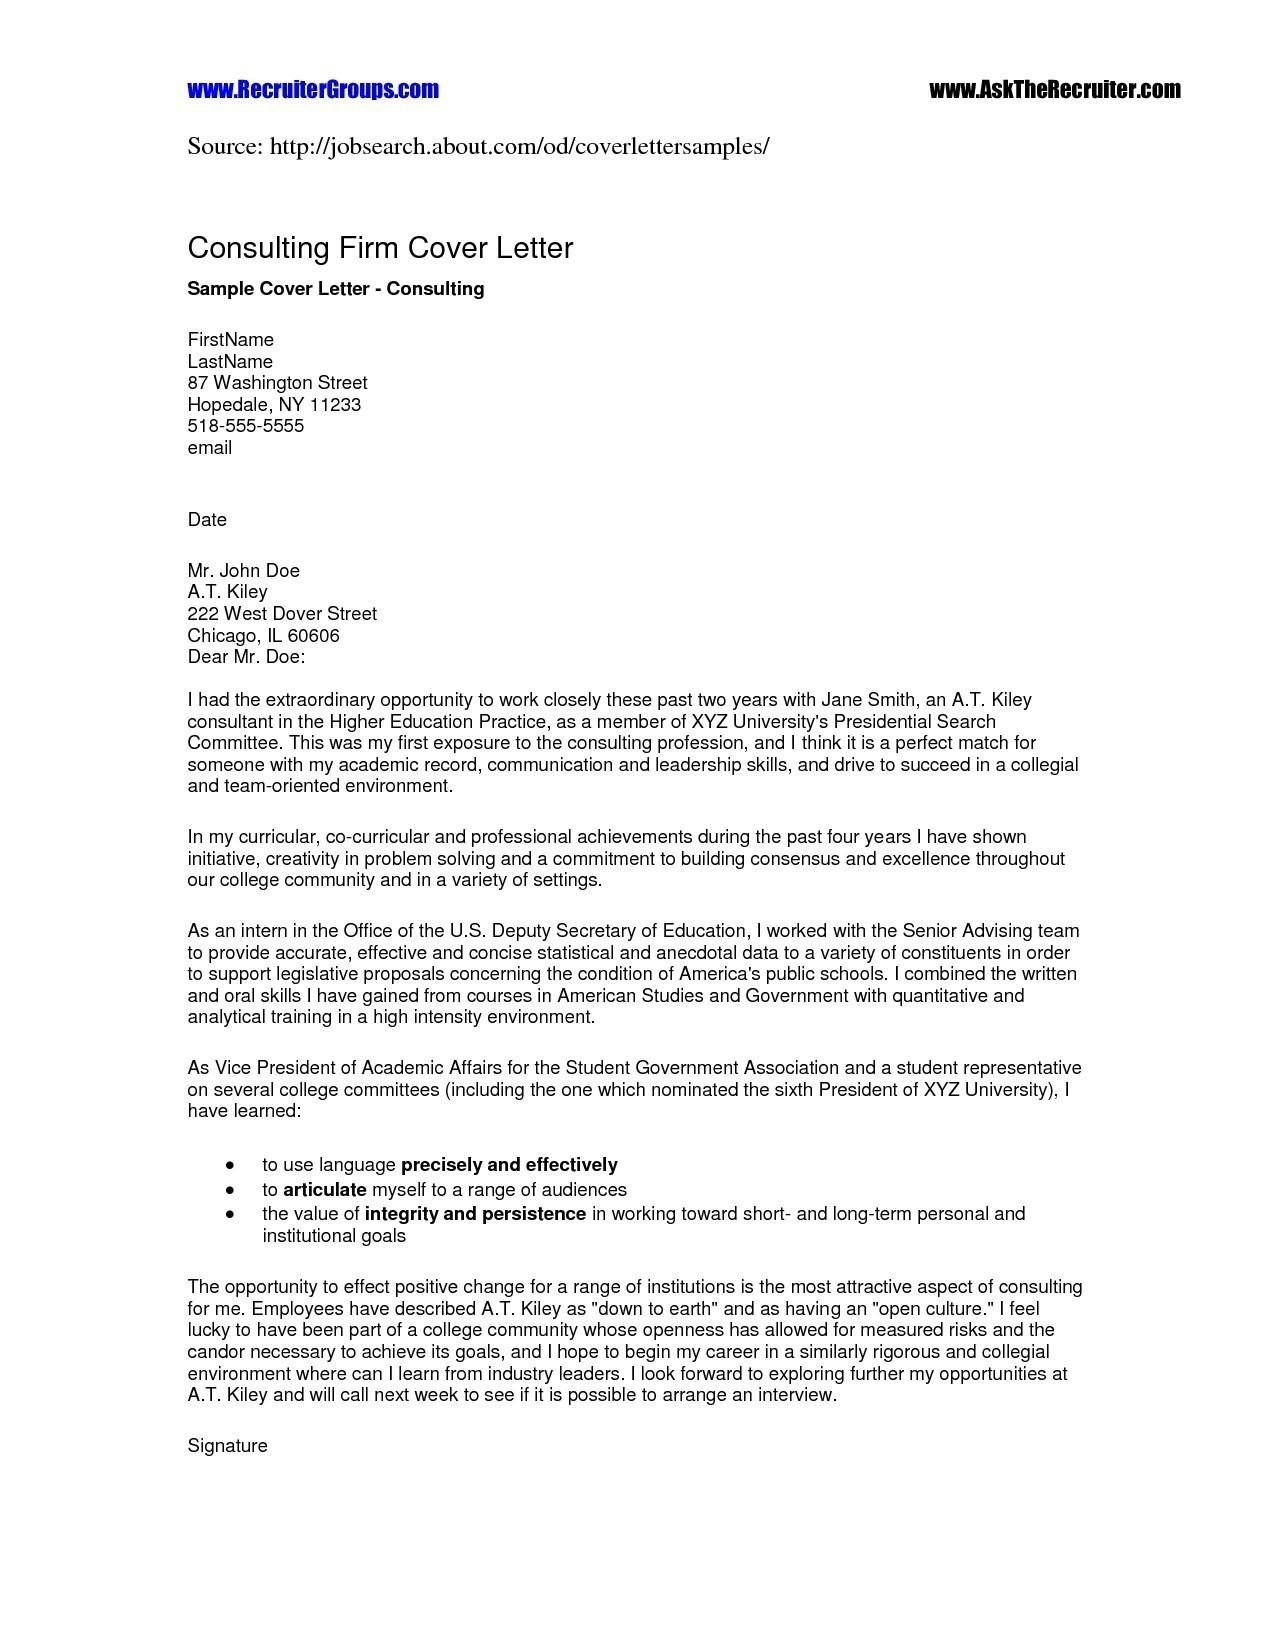 verification letter template example-Sample Job Verification Letter Refrence Job Application Letter Format Template Copy Cover Letter Template Hr 2-b